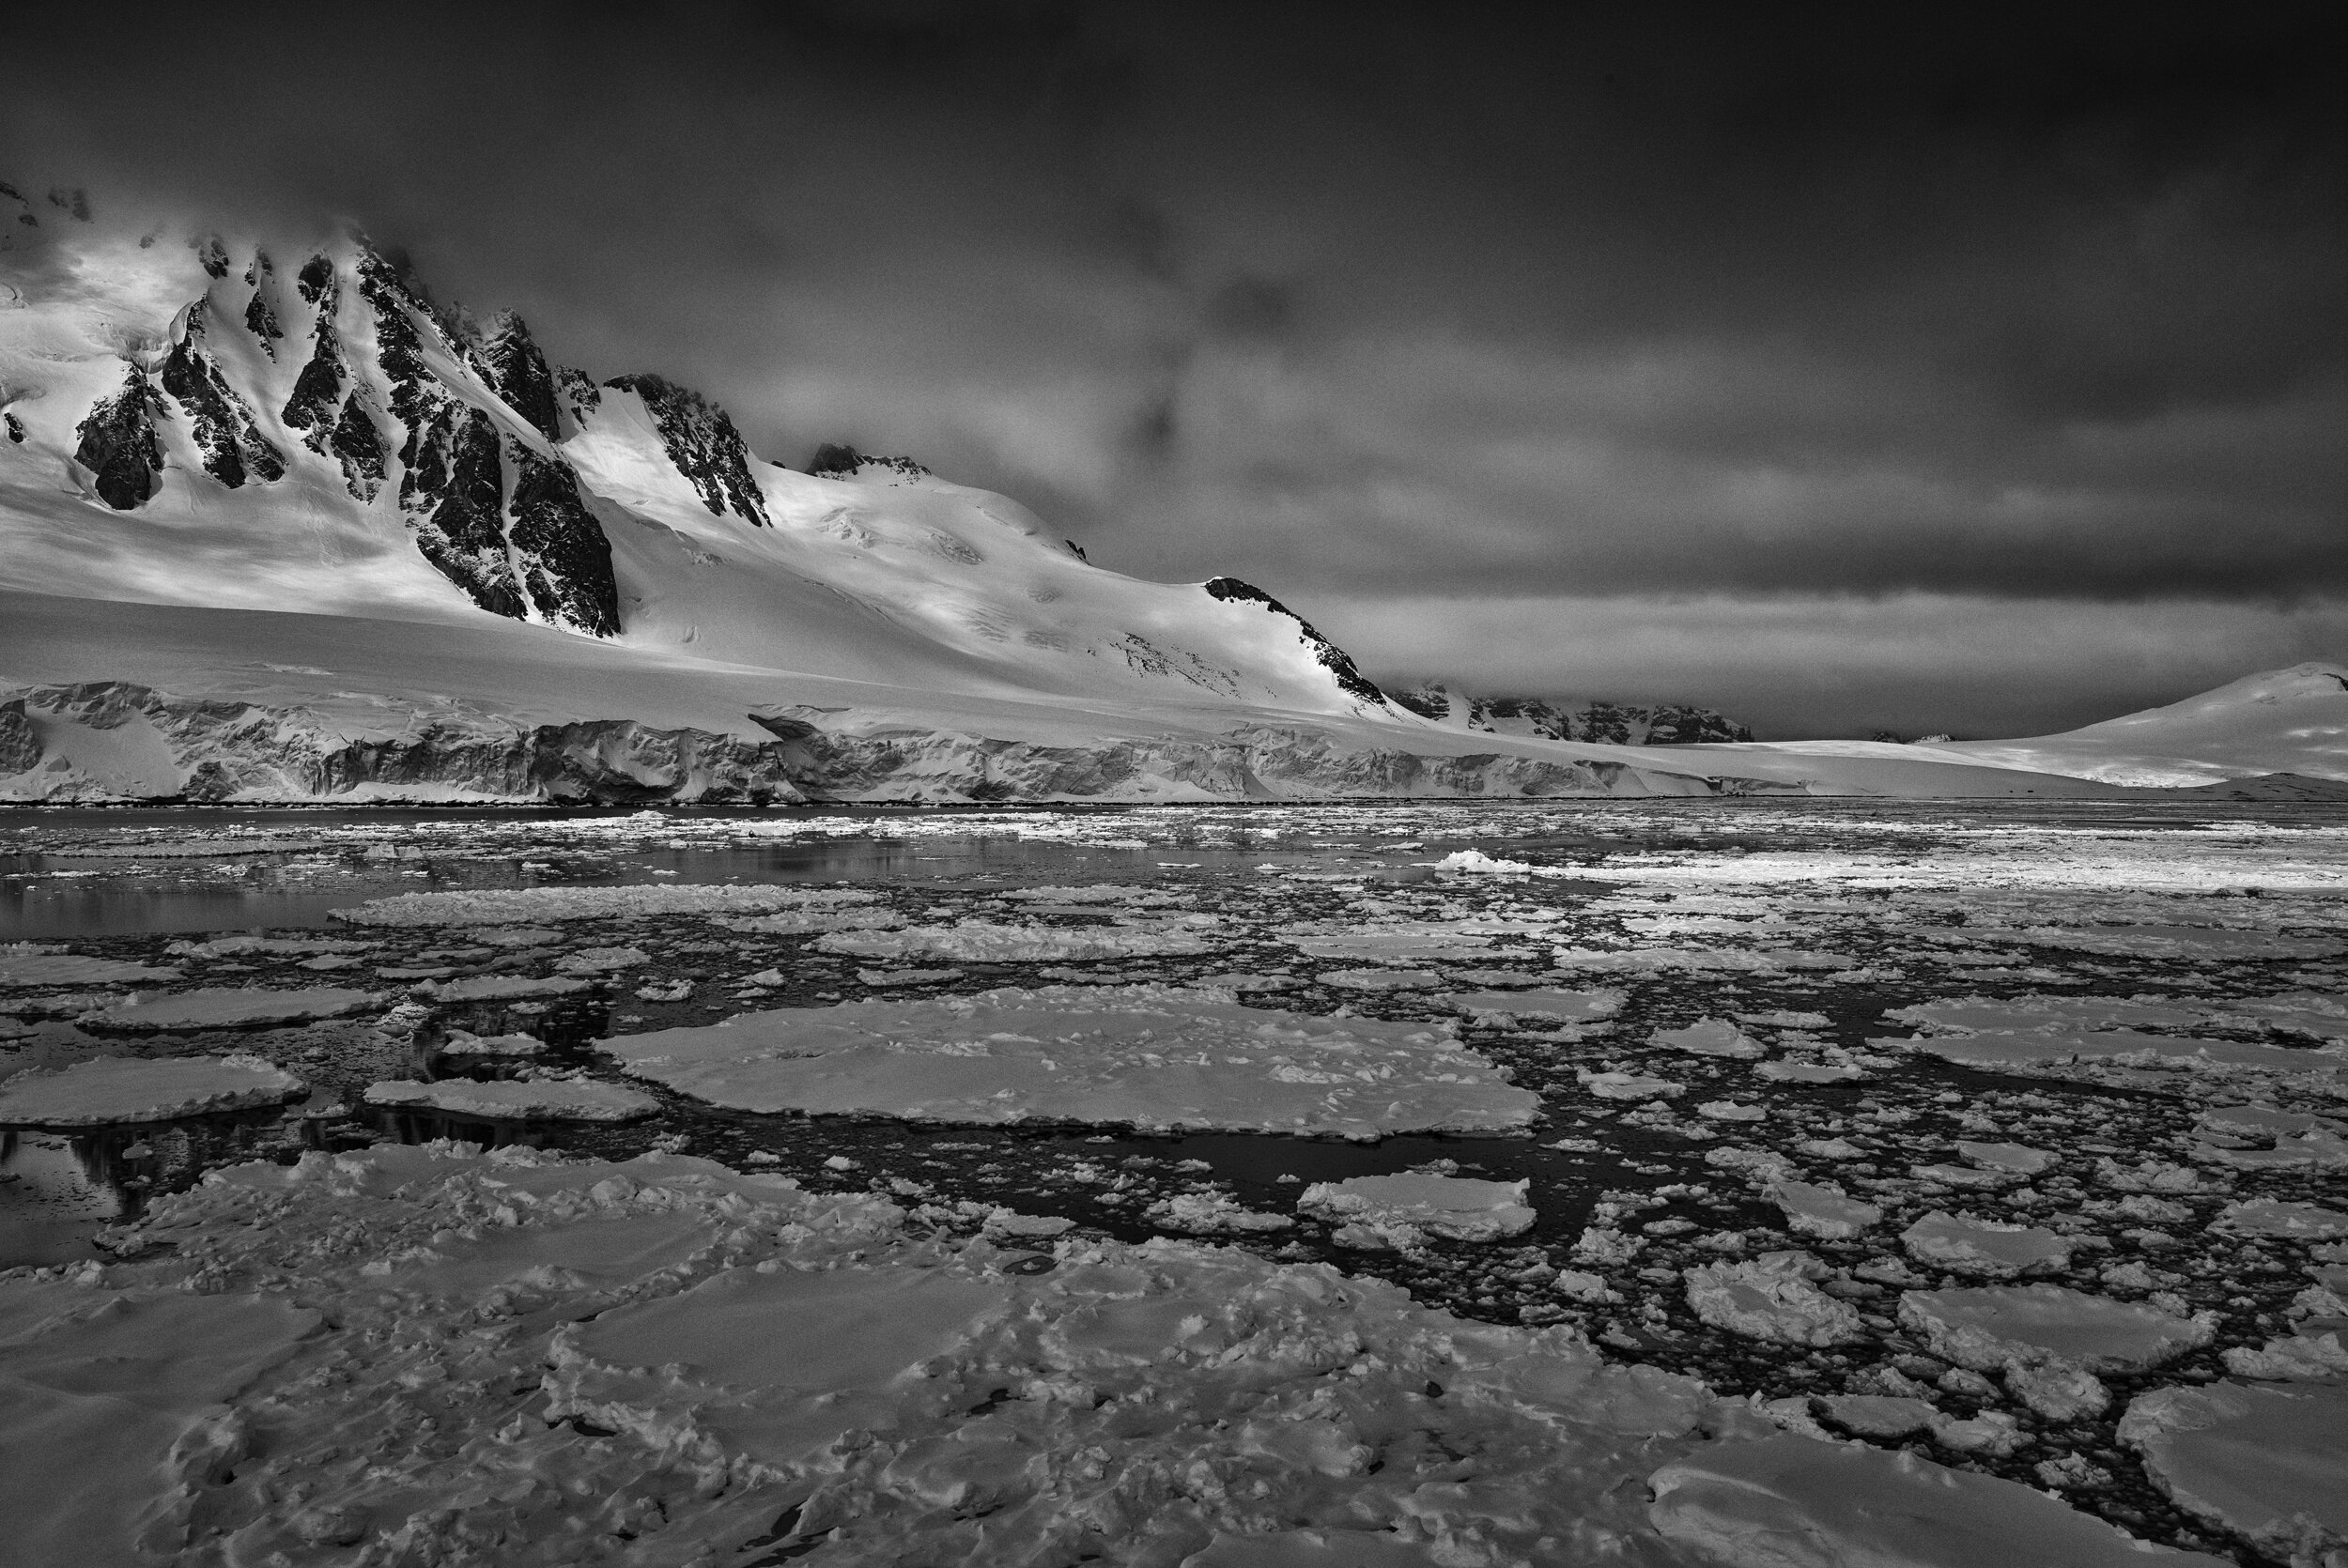 manuel_uebler_antarctica_bw_013.jpg